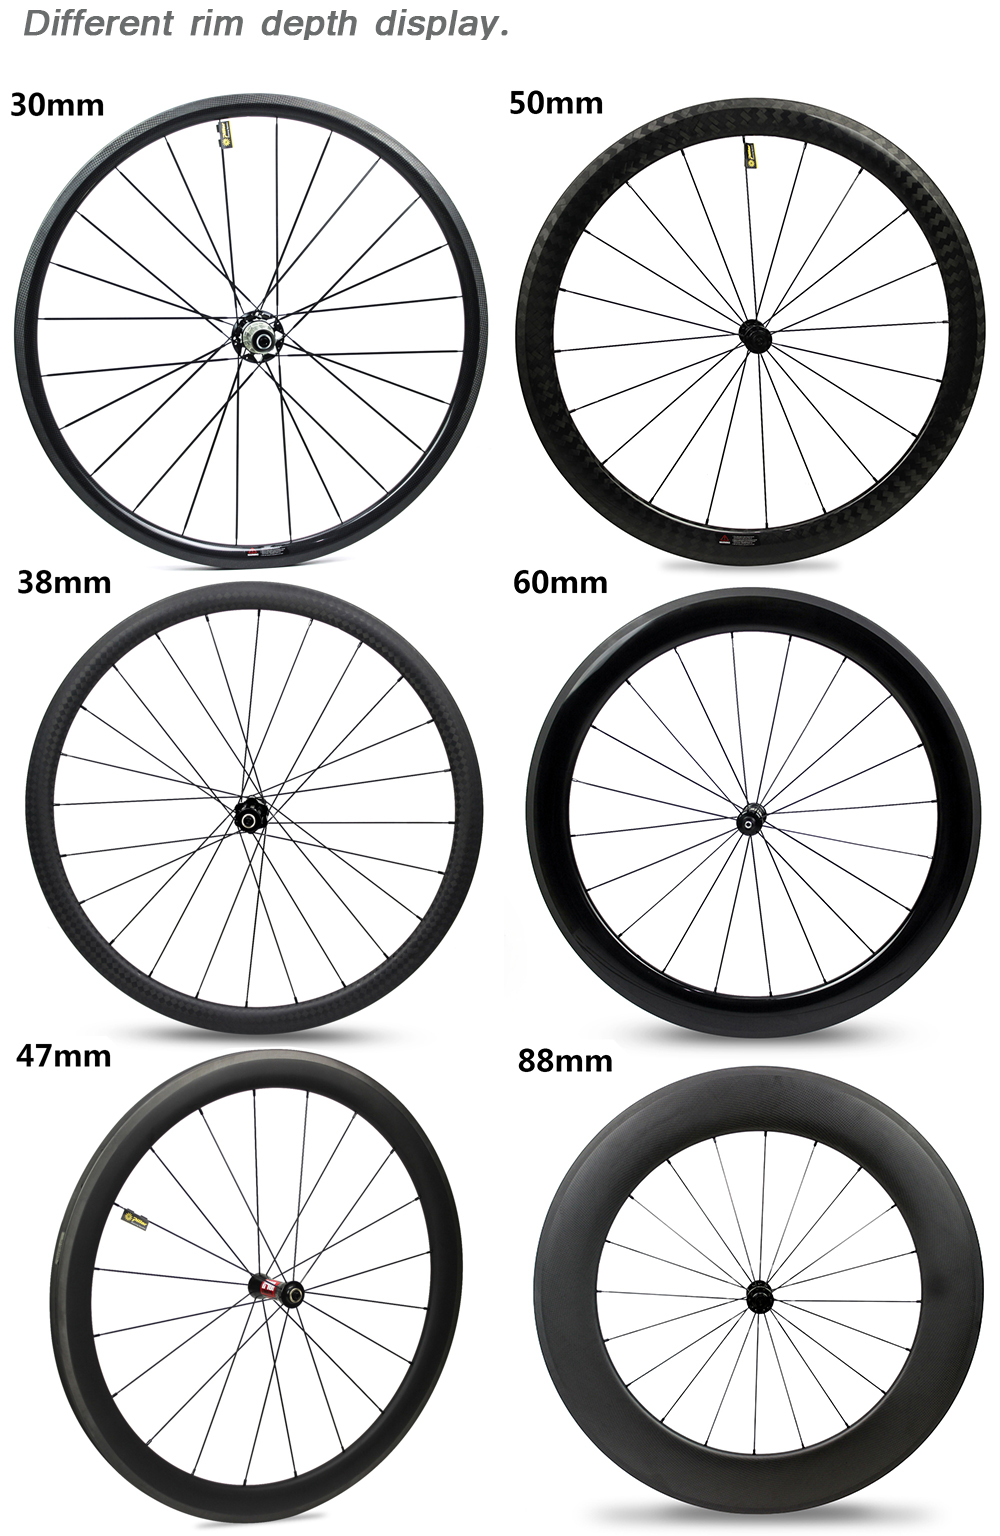 Chinese carbon fiber rim 50mm depth 700c cycling clincher carbon wheels